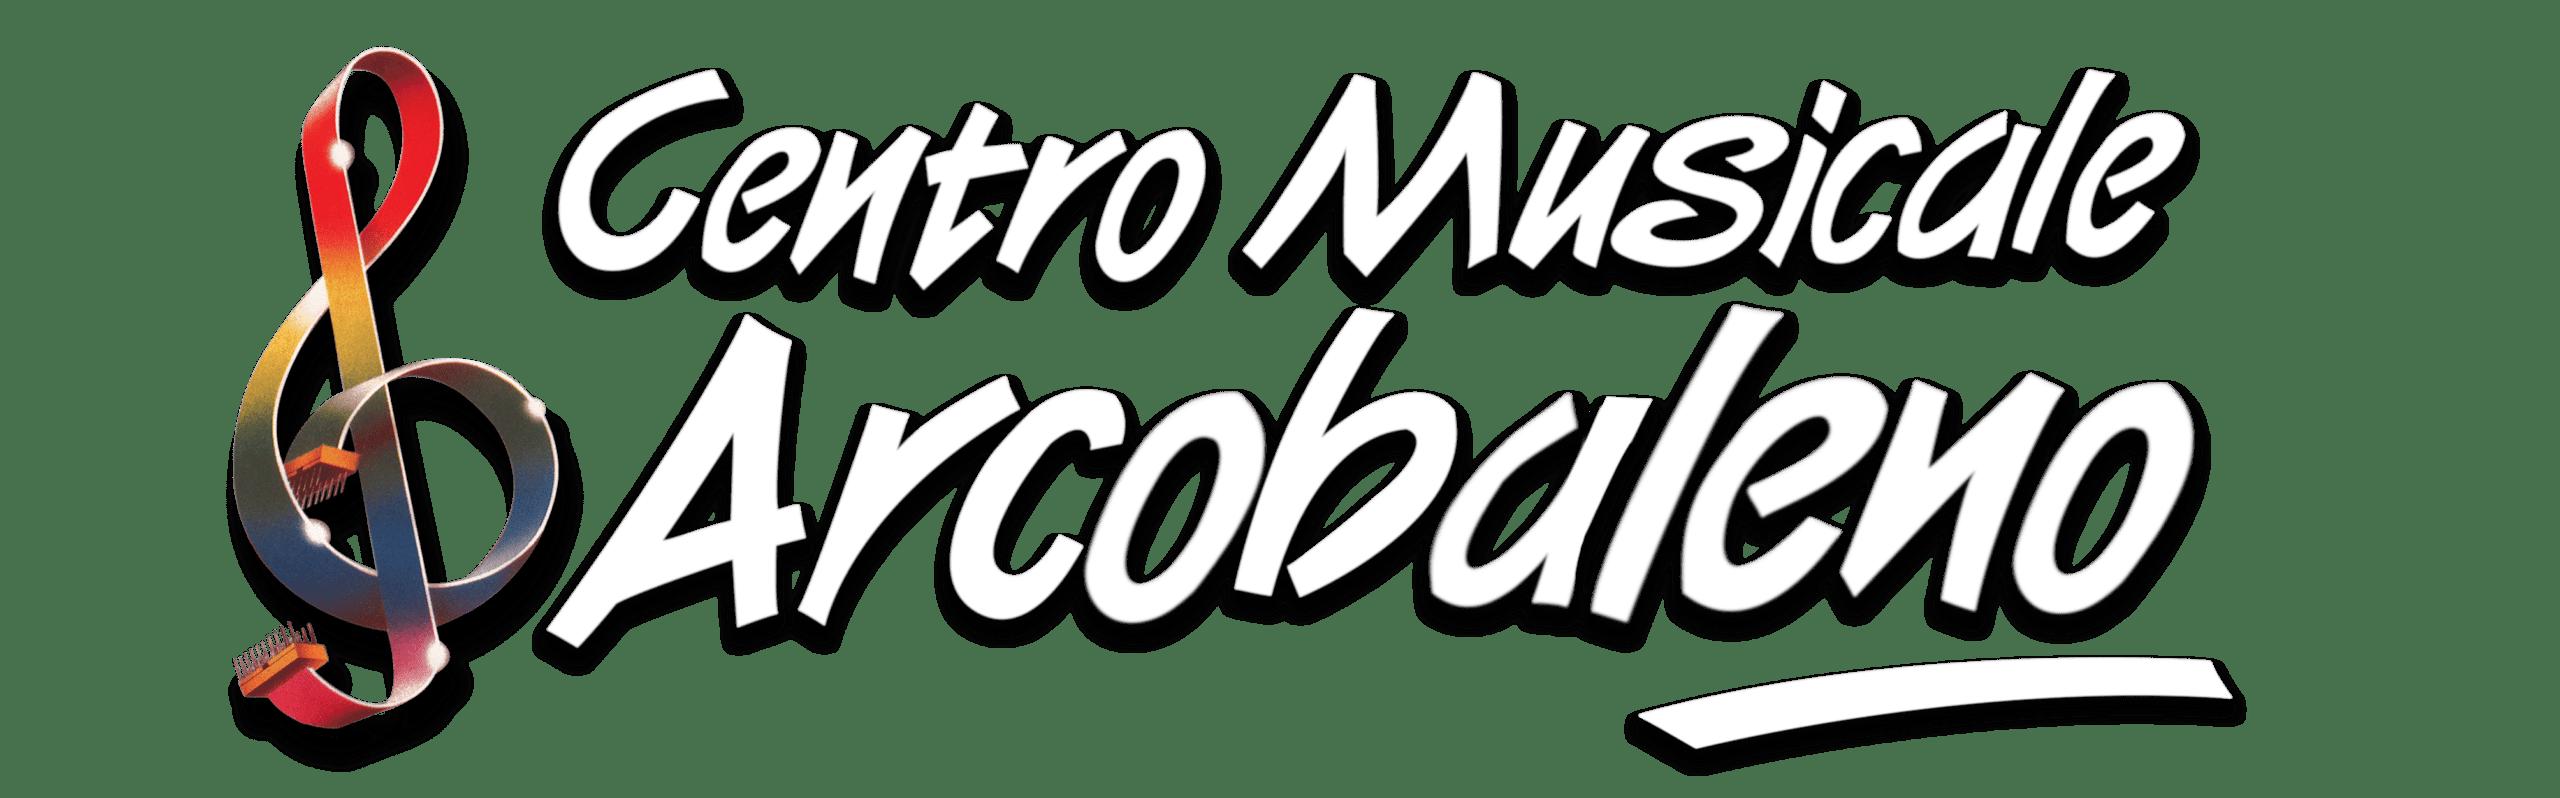 Arcobaleno Centro Musicale